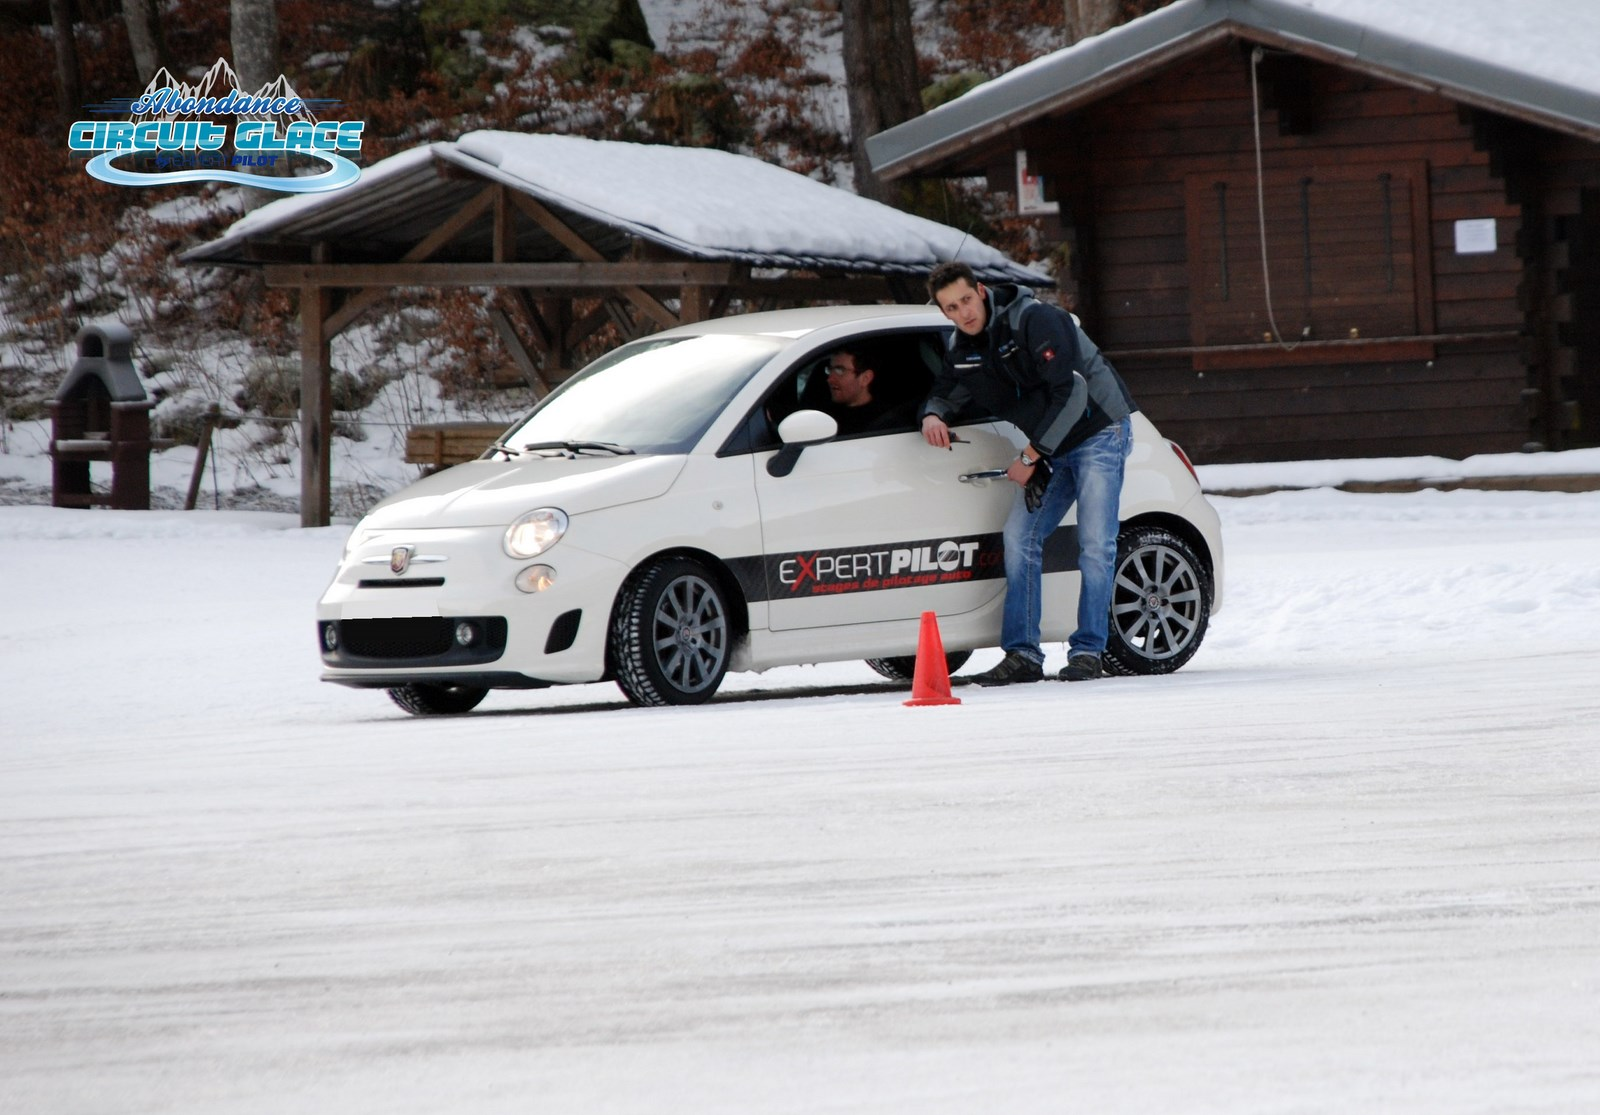 Circuit-abondance-stage-conduite-glace (41)